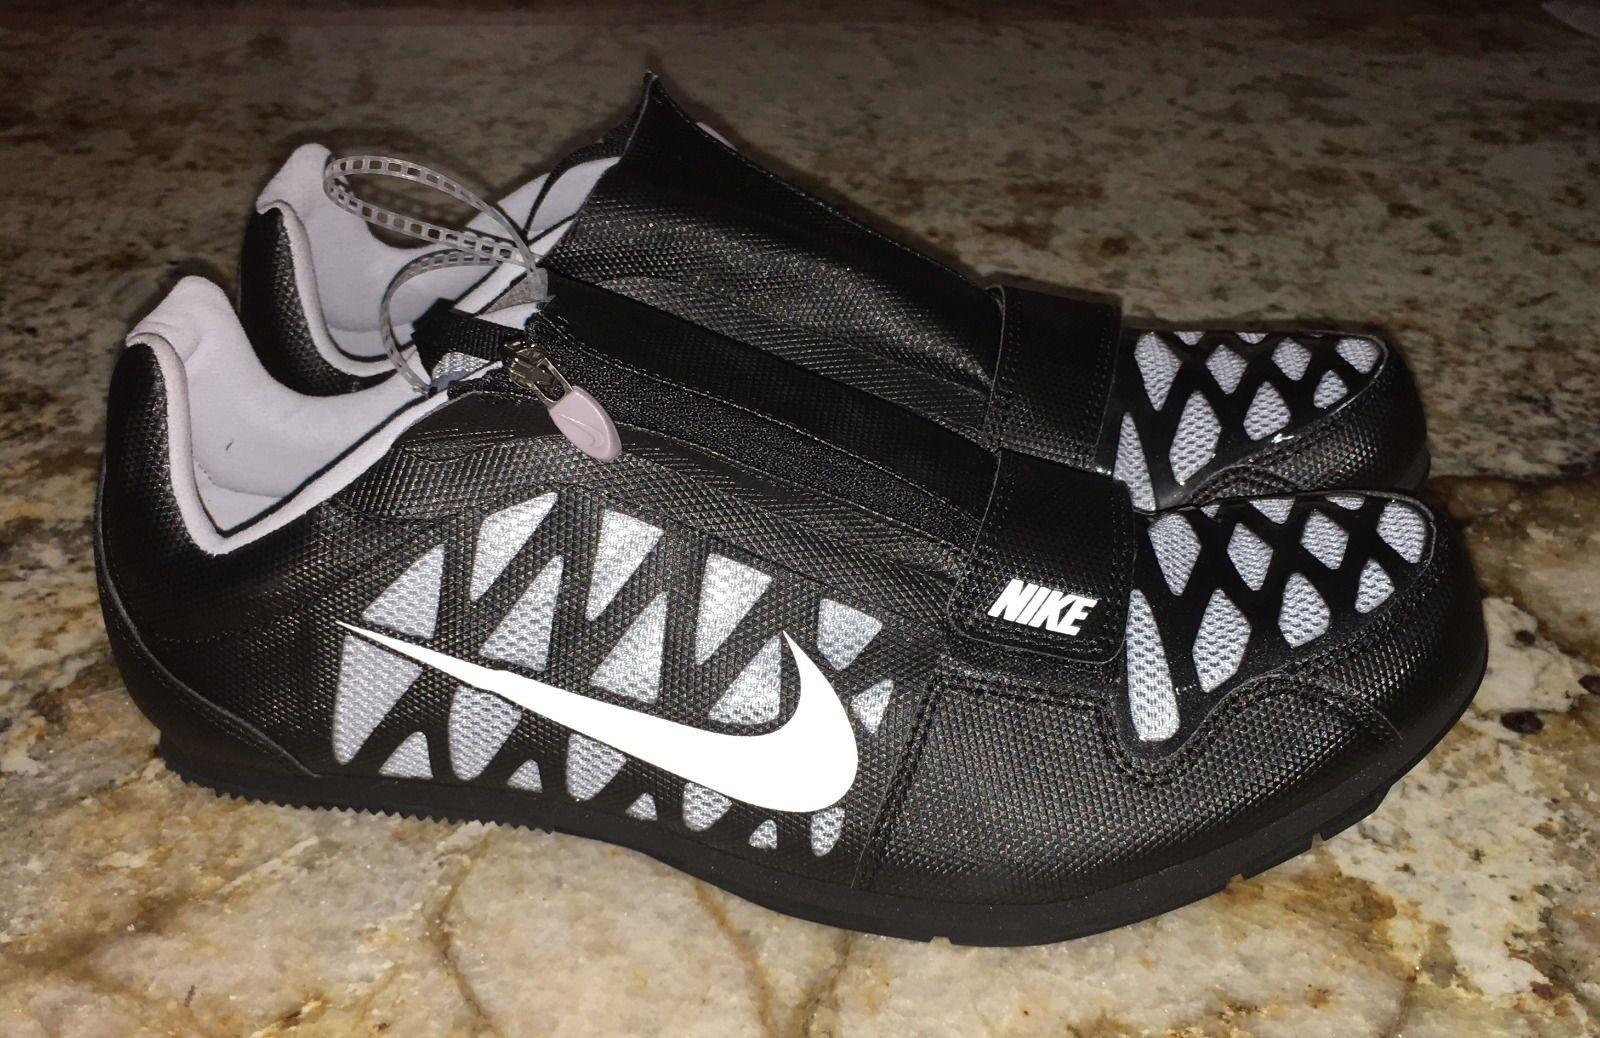 38b761048cd Nike Zoom LJ 4 Track   Field Long Jump Shoes Spikes Black Gray ...